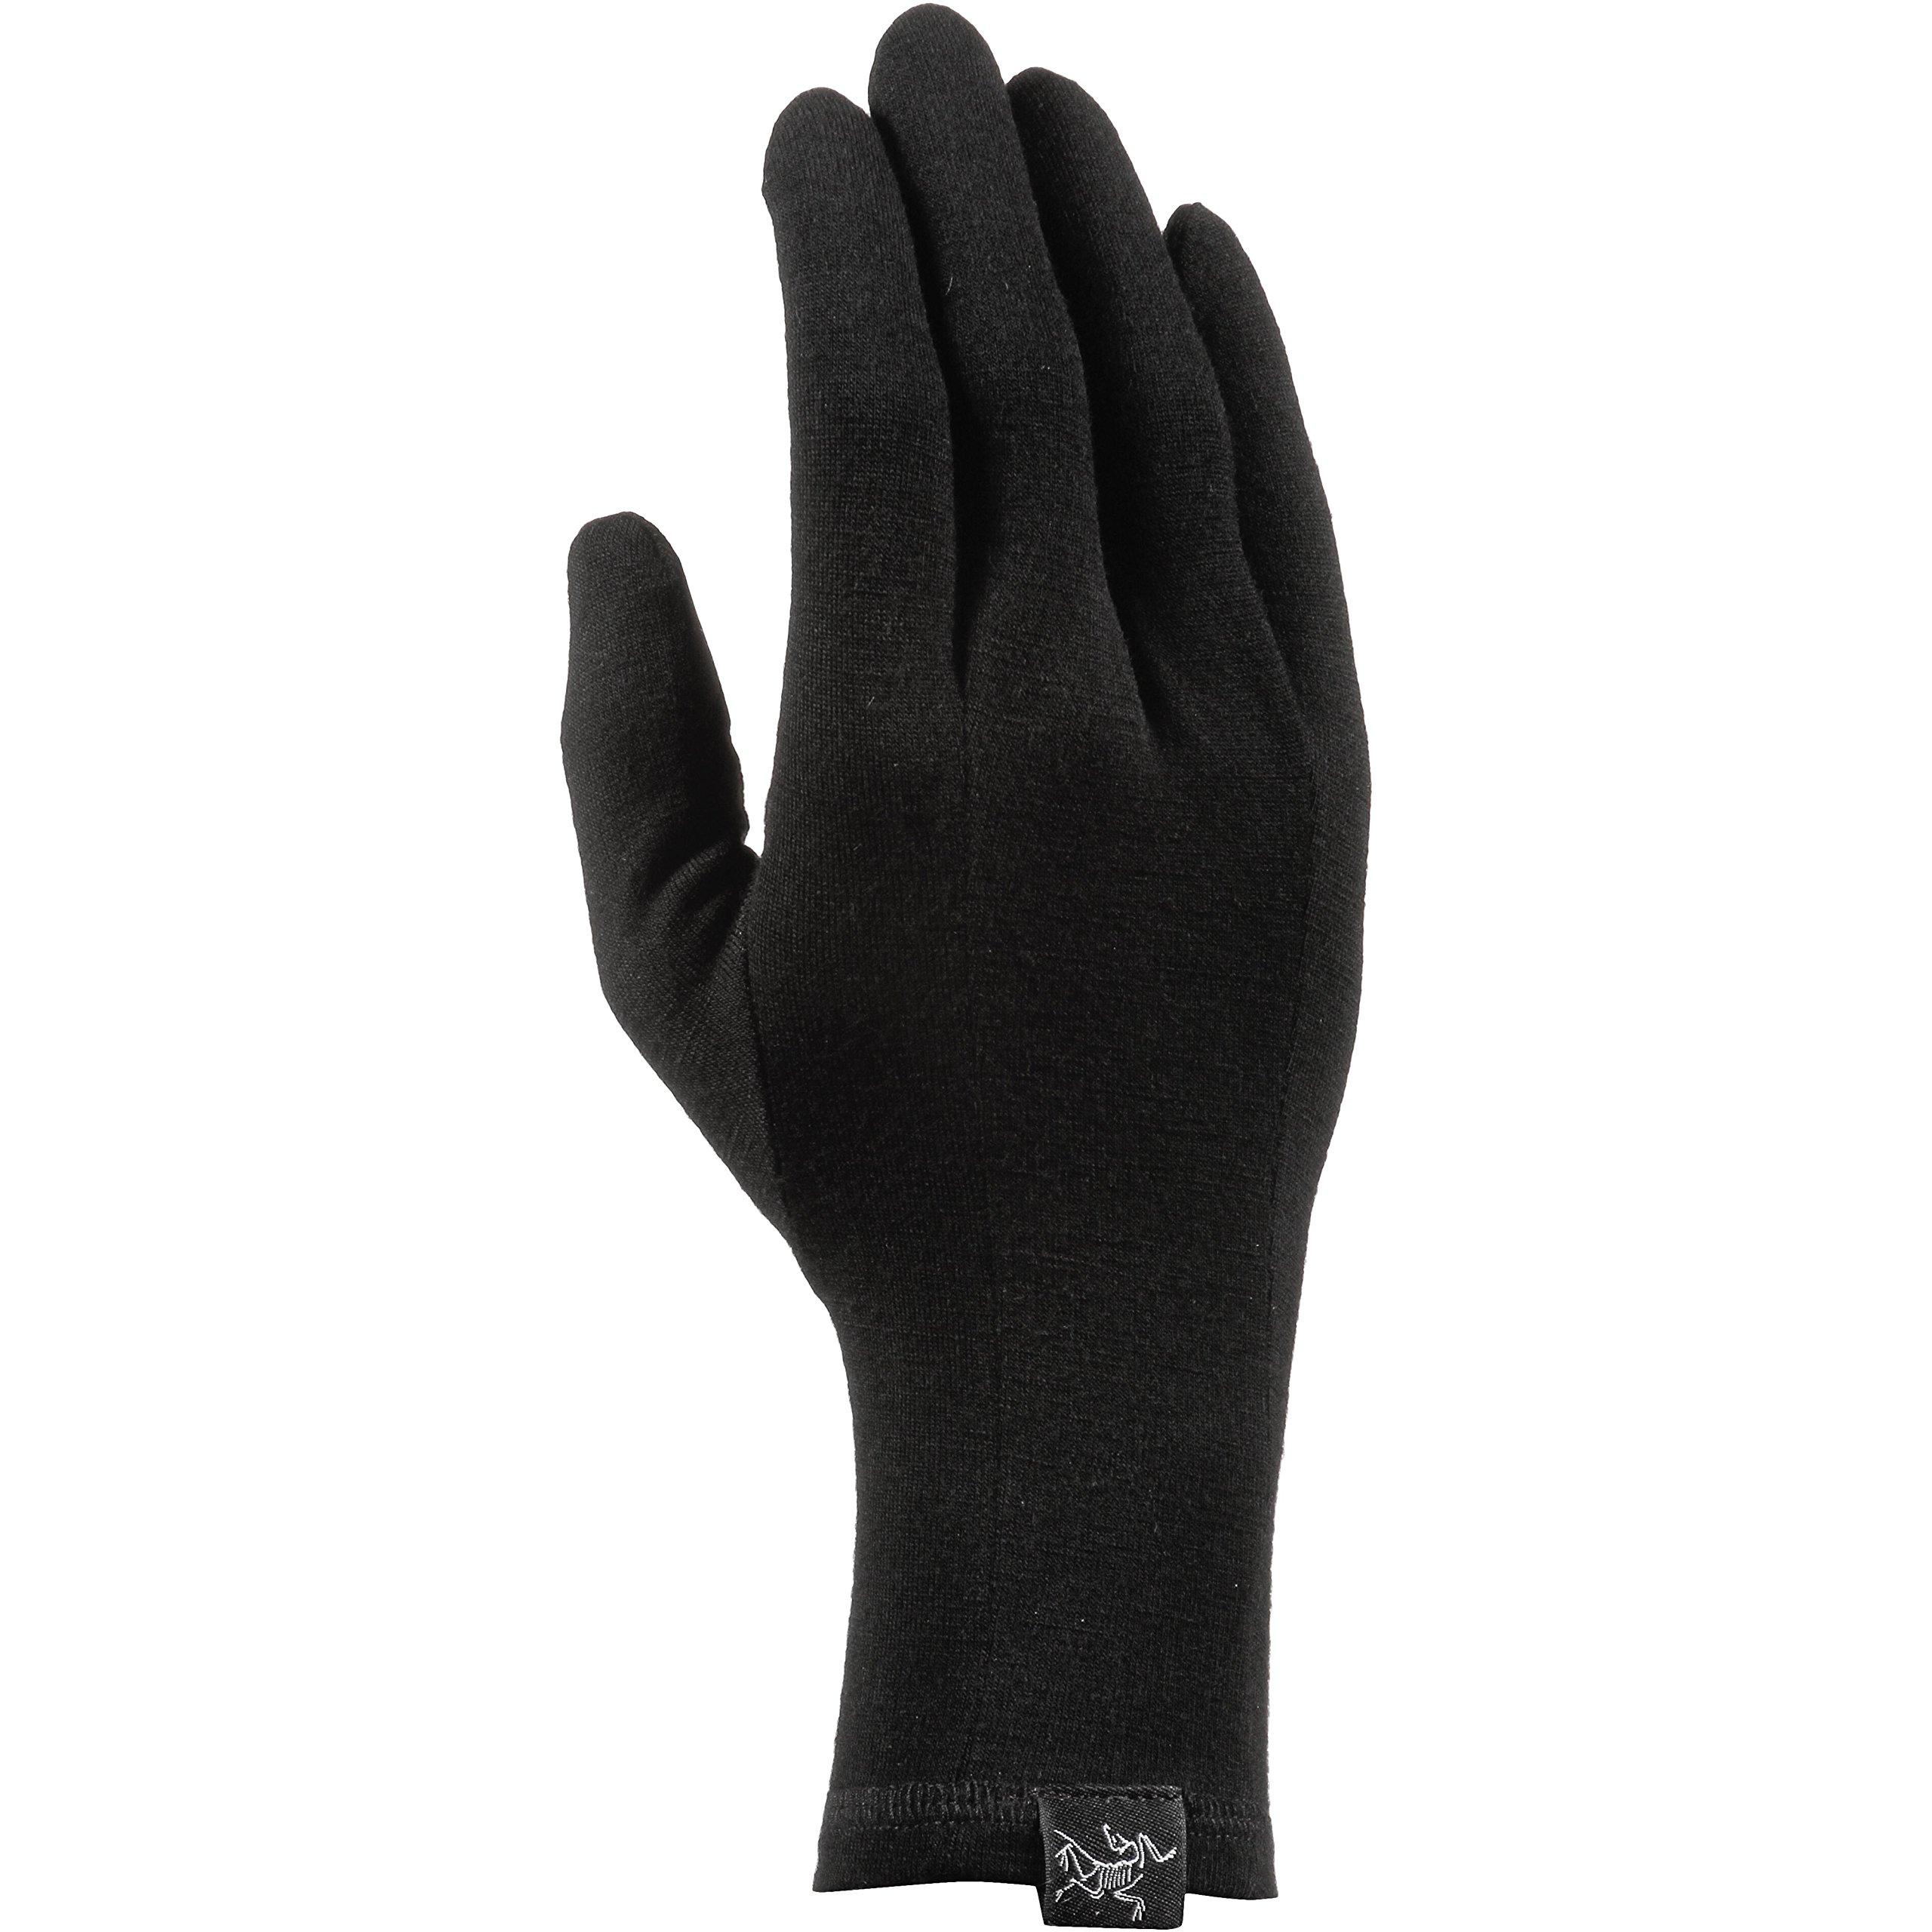 Arc'teryx Gothic Glove (Black, Medium)